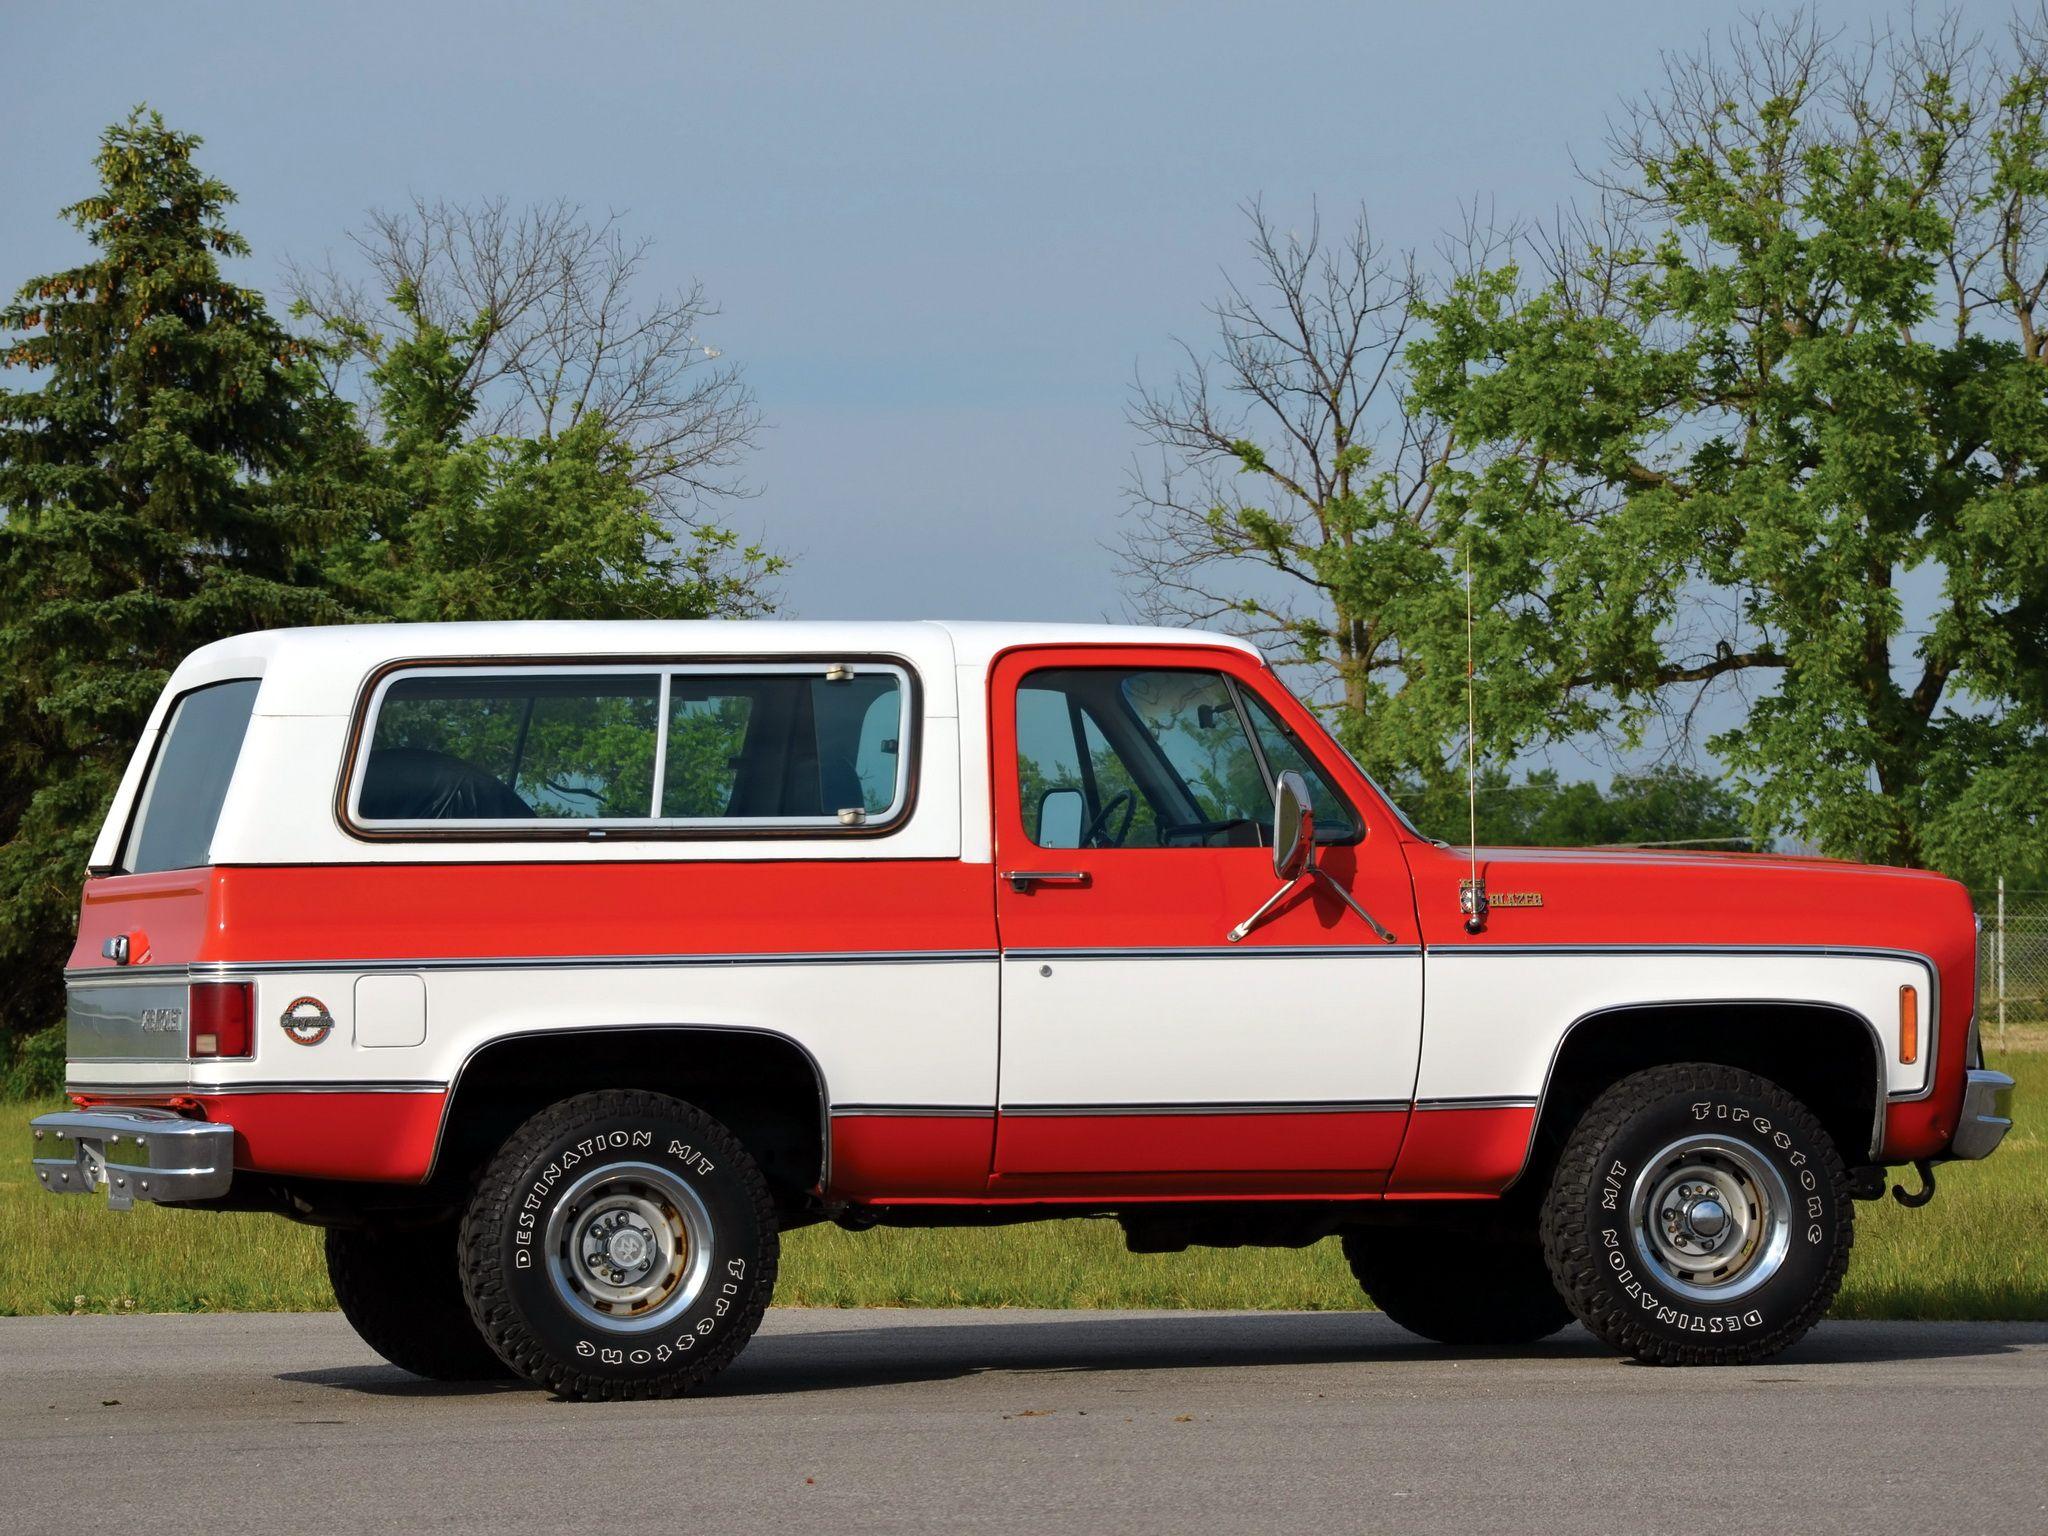 Home by year 1979 cars 1979 trucks car pictures - K5 Chevy Blazer 1979 Chevrolet K5 Blazer 1978 79